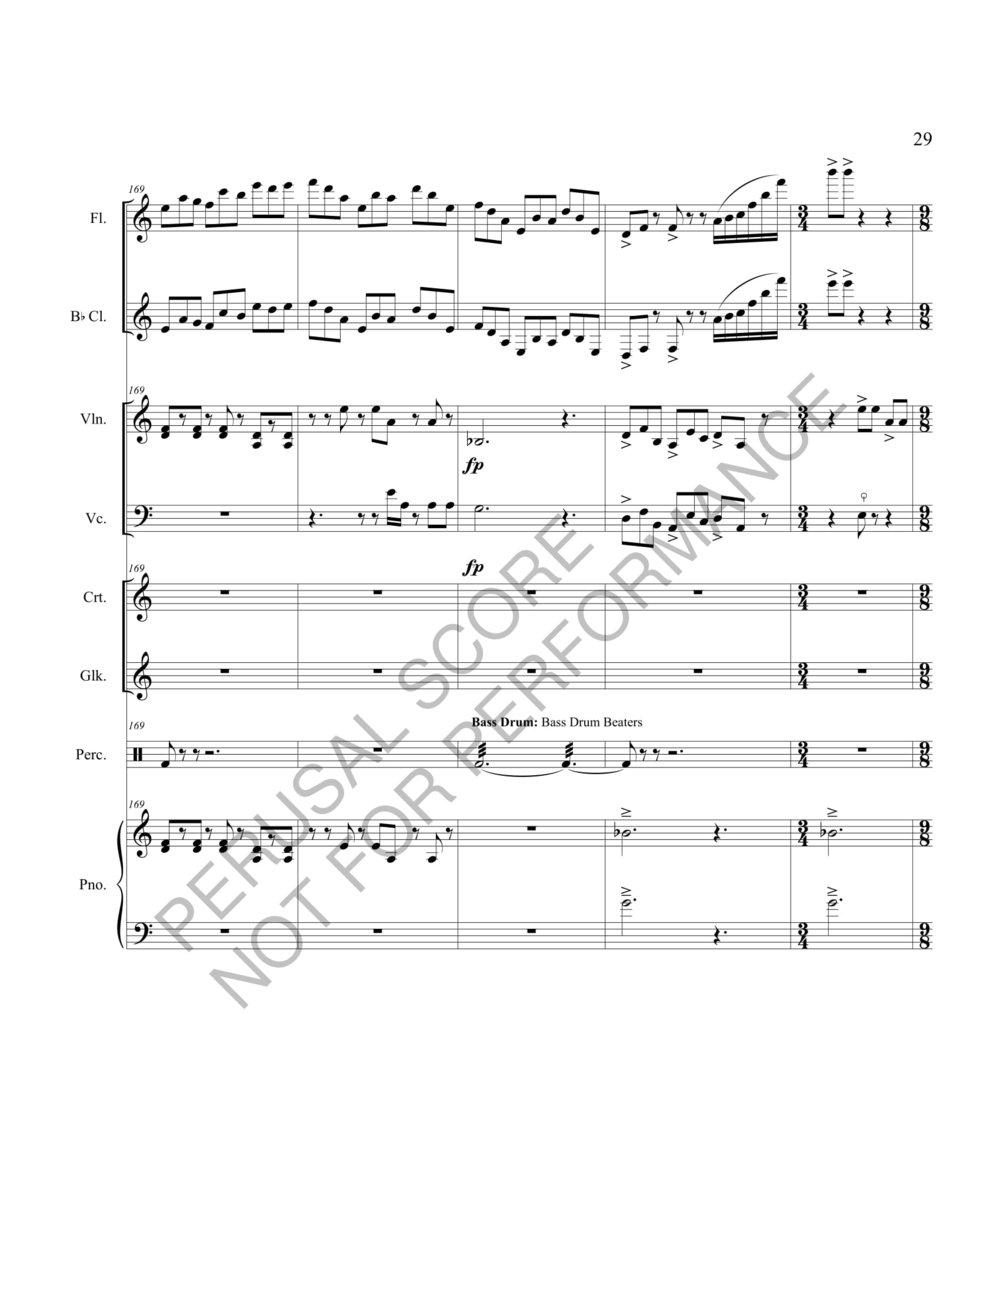 Boyd Terra Liberi Score-watermark-35.jpg